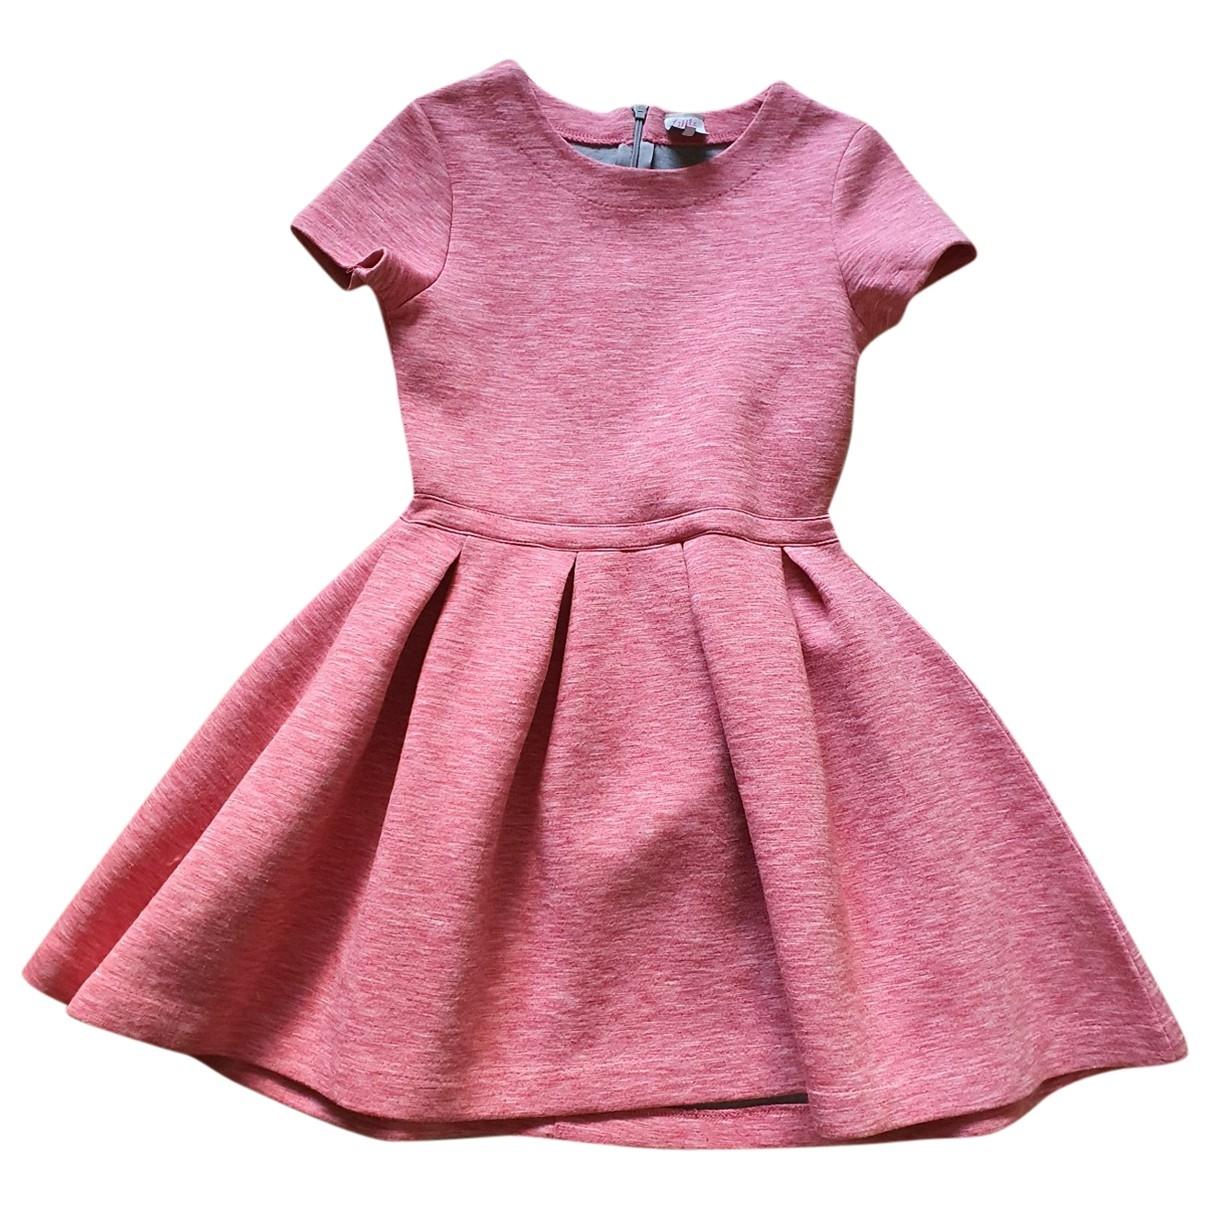 Karl Marc John \N Pink dress for Kids 10 years - up to 142cm FR